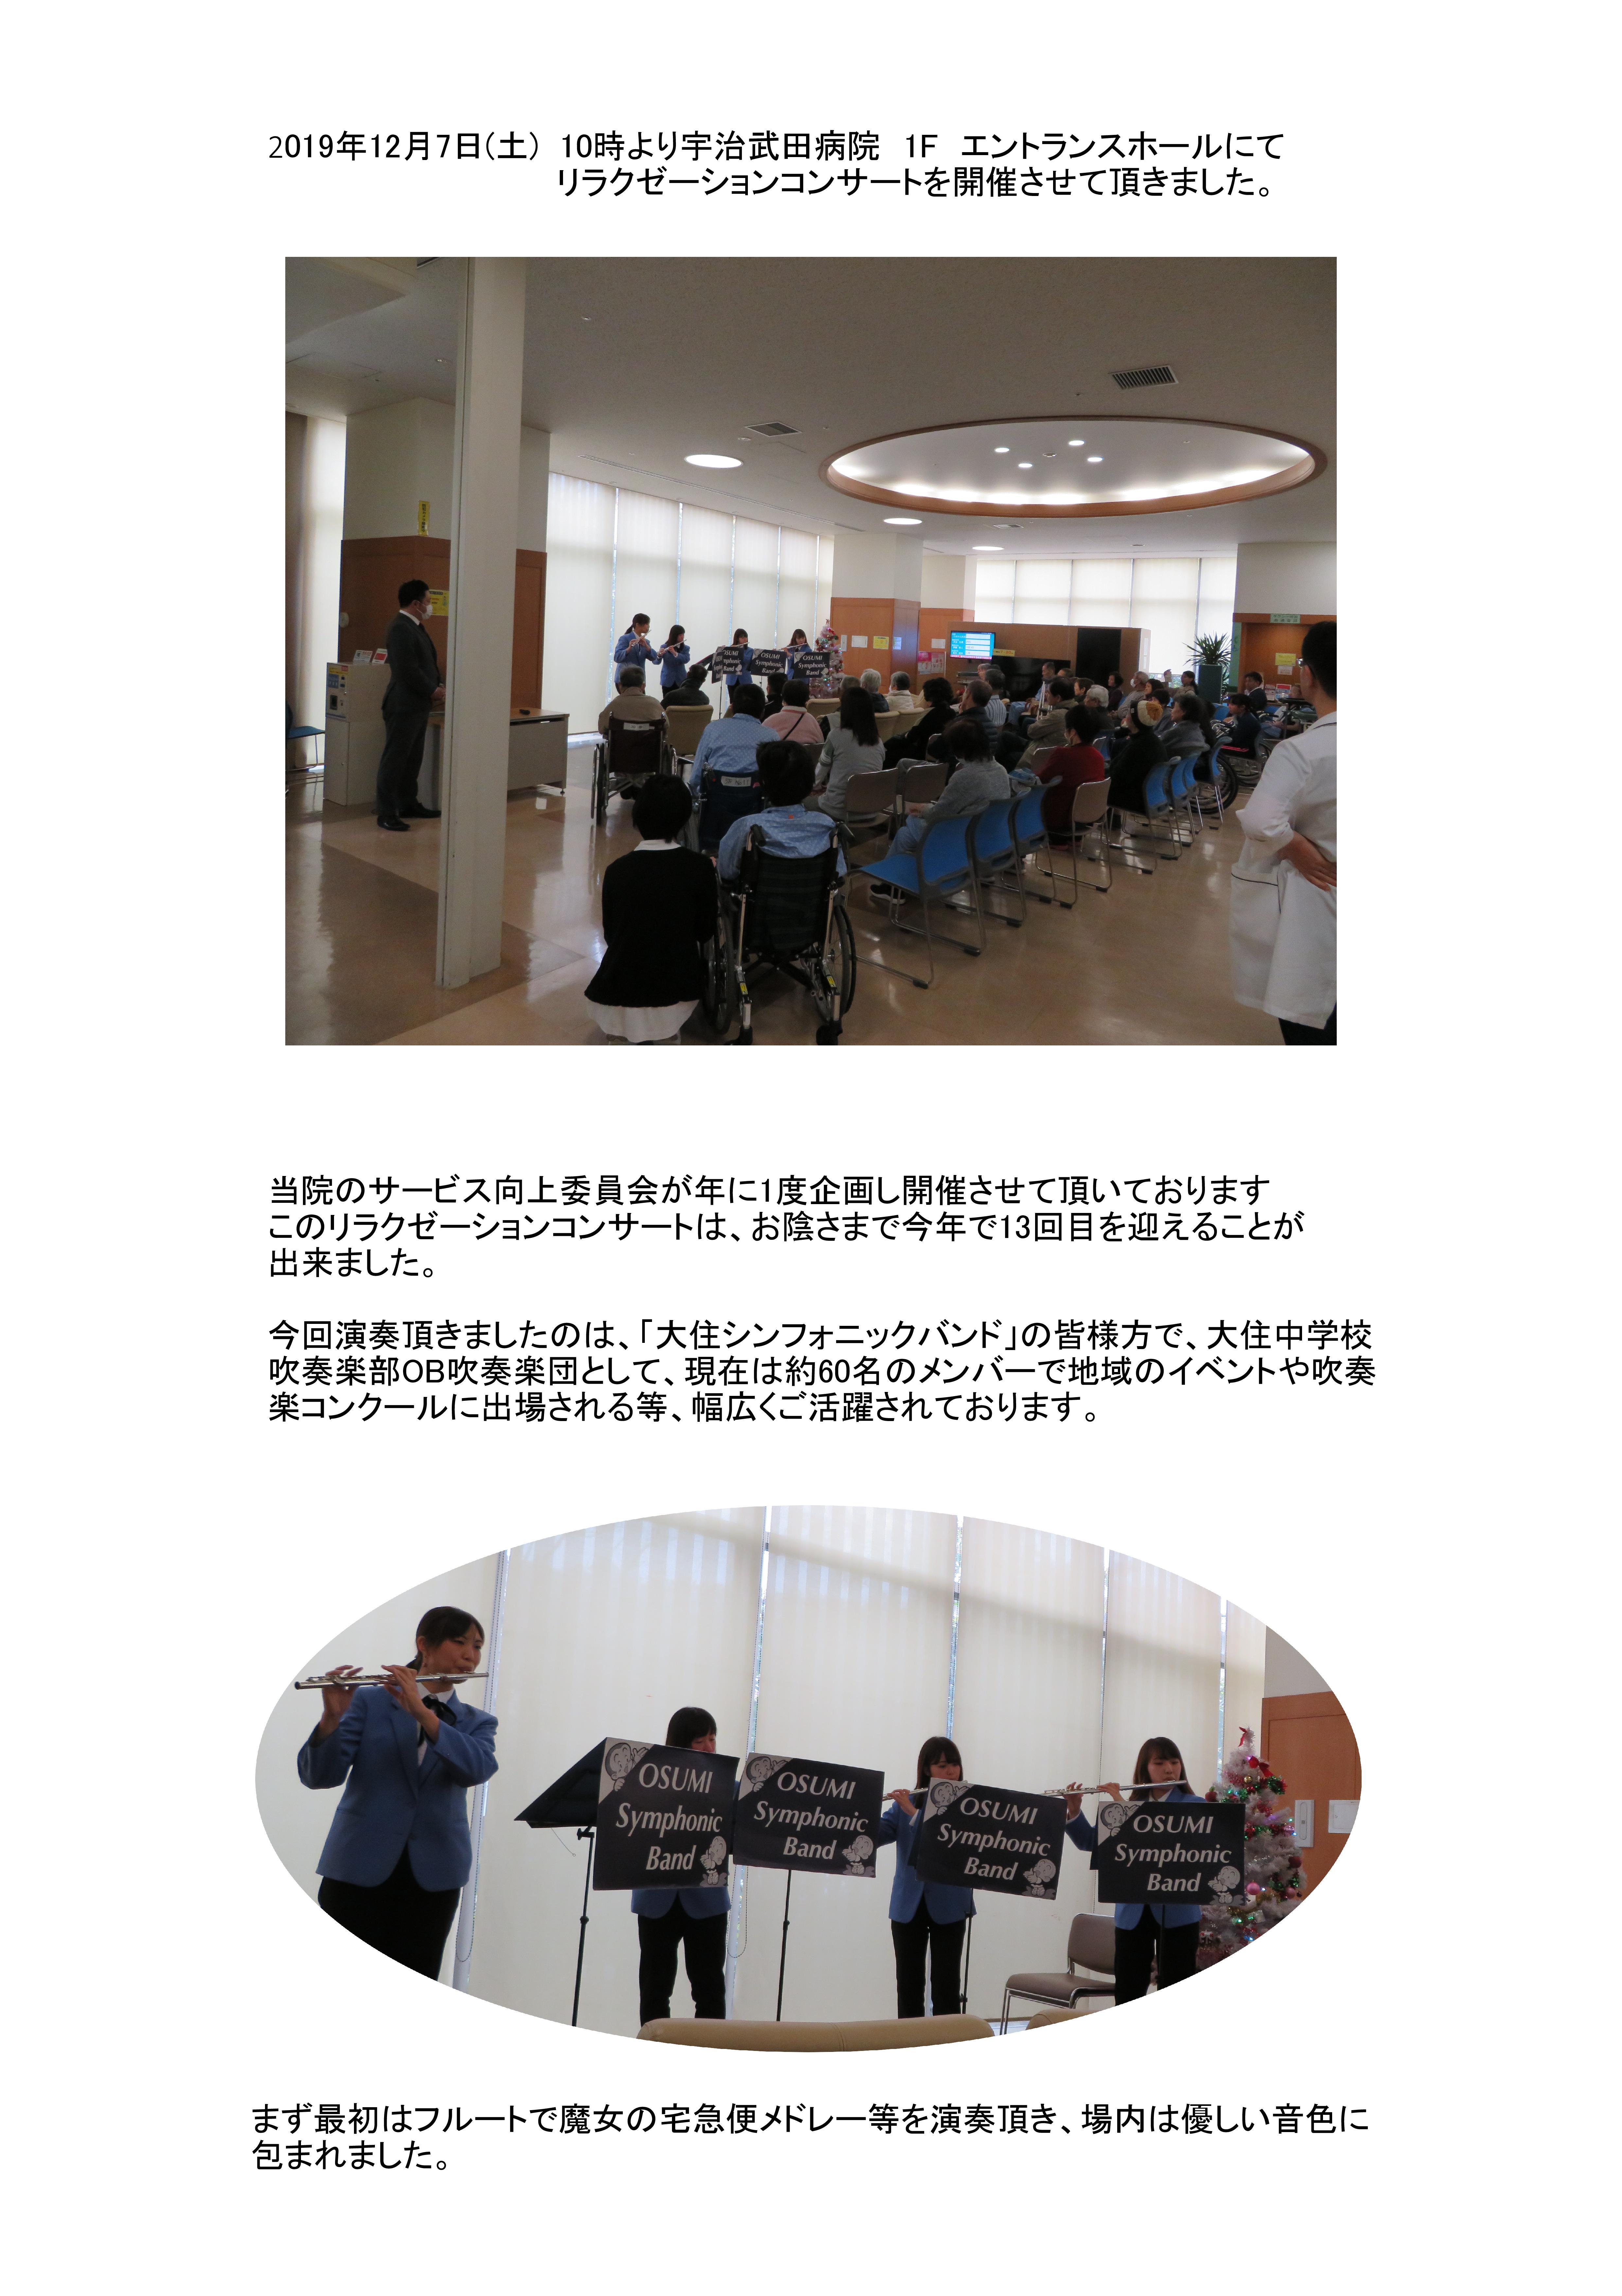 http://www.takedahp.or.jp/publicity/items/2019%E5%B9%B412%E6%9C%887%E6%97%A5-01.jpg